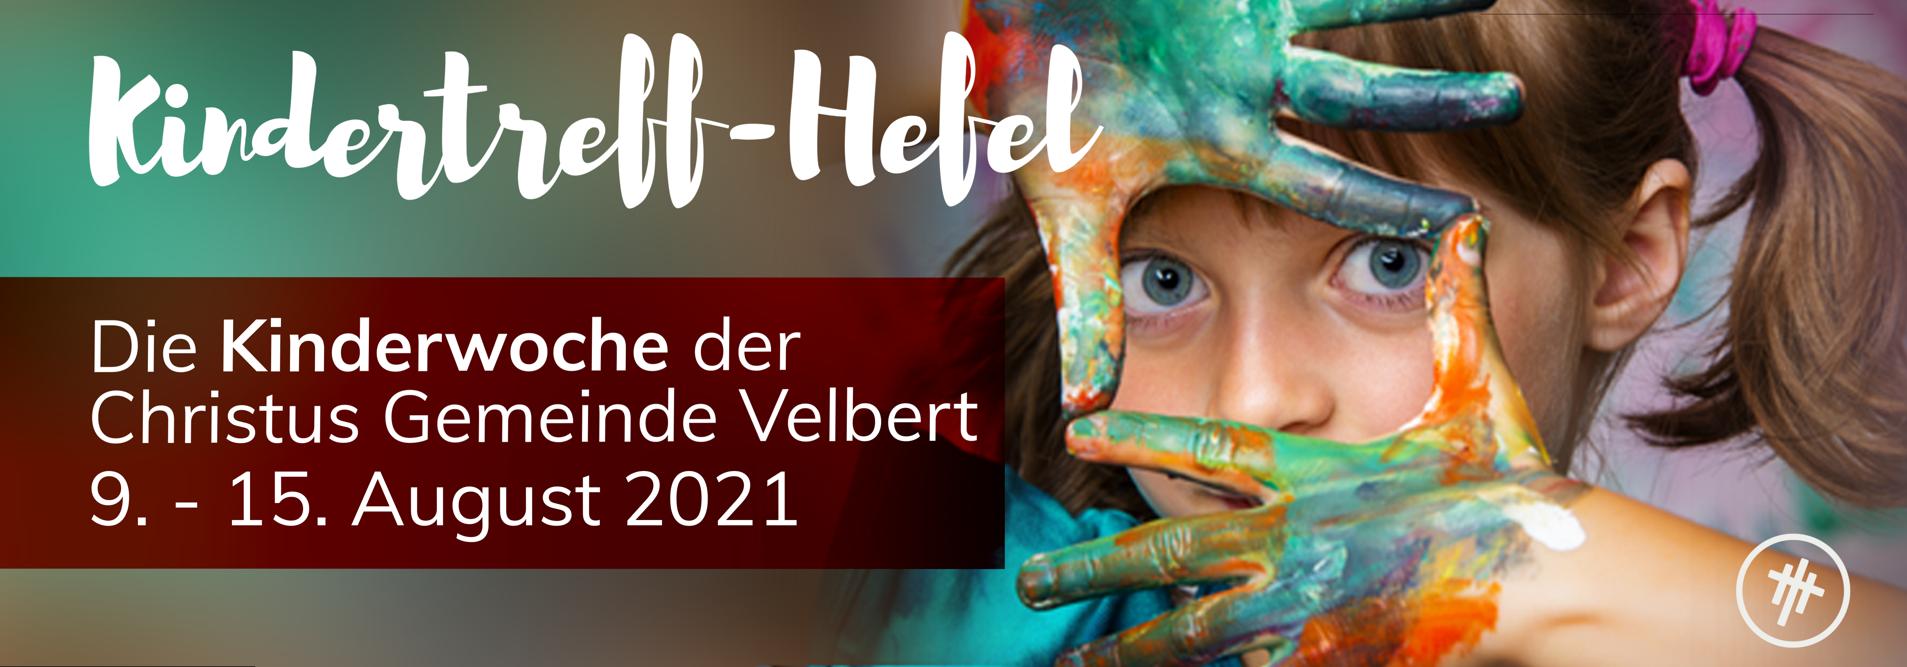 Kindertreff Hefel 2021